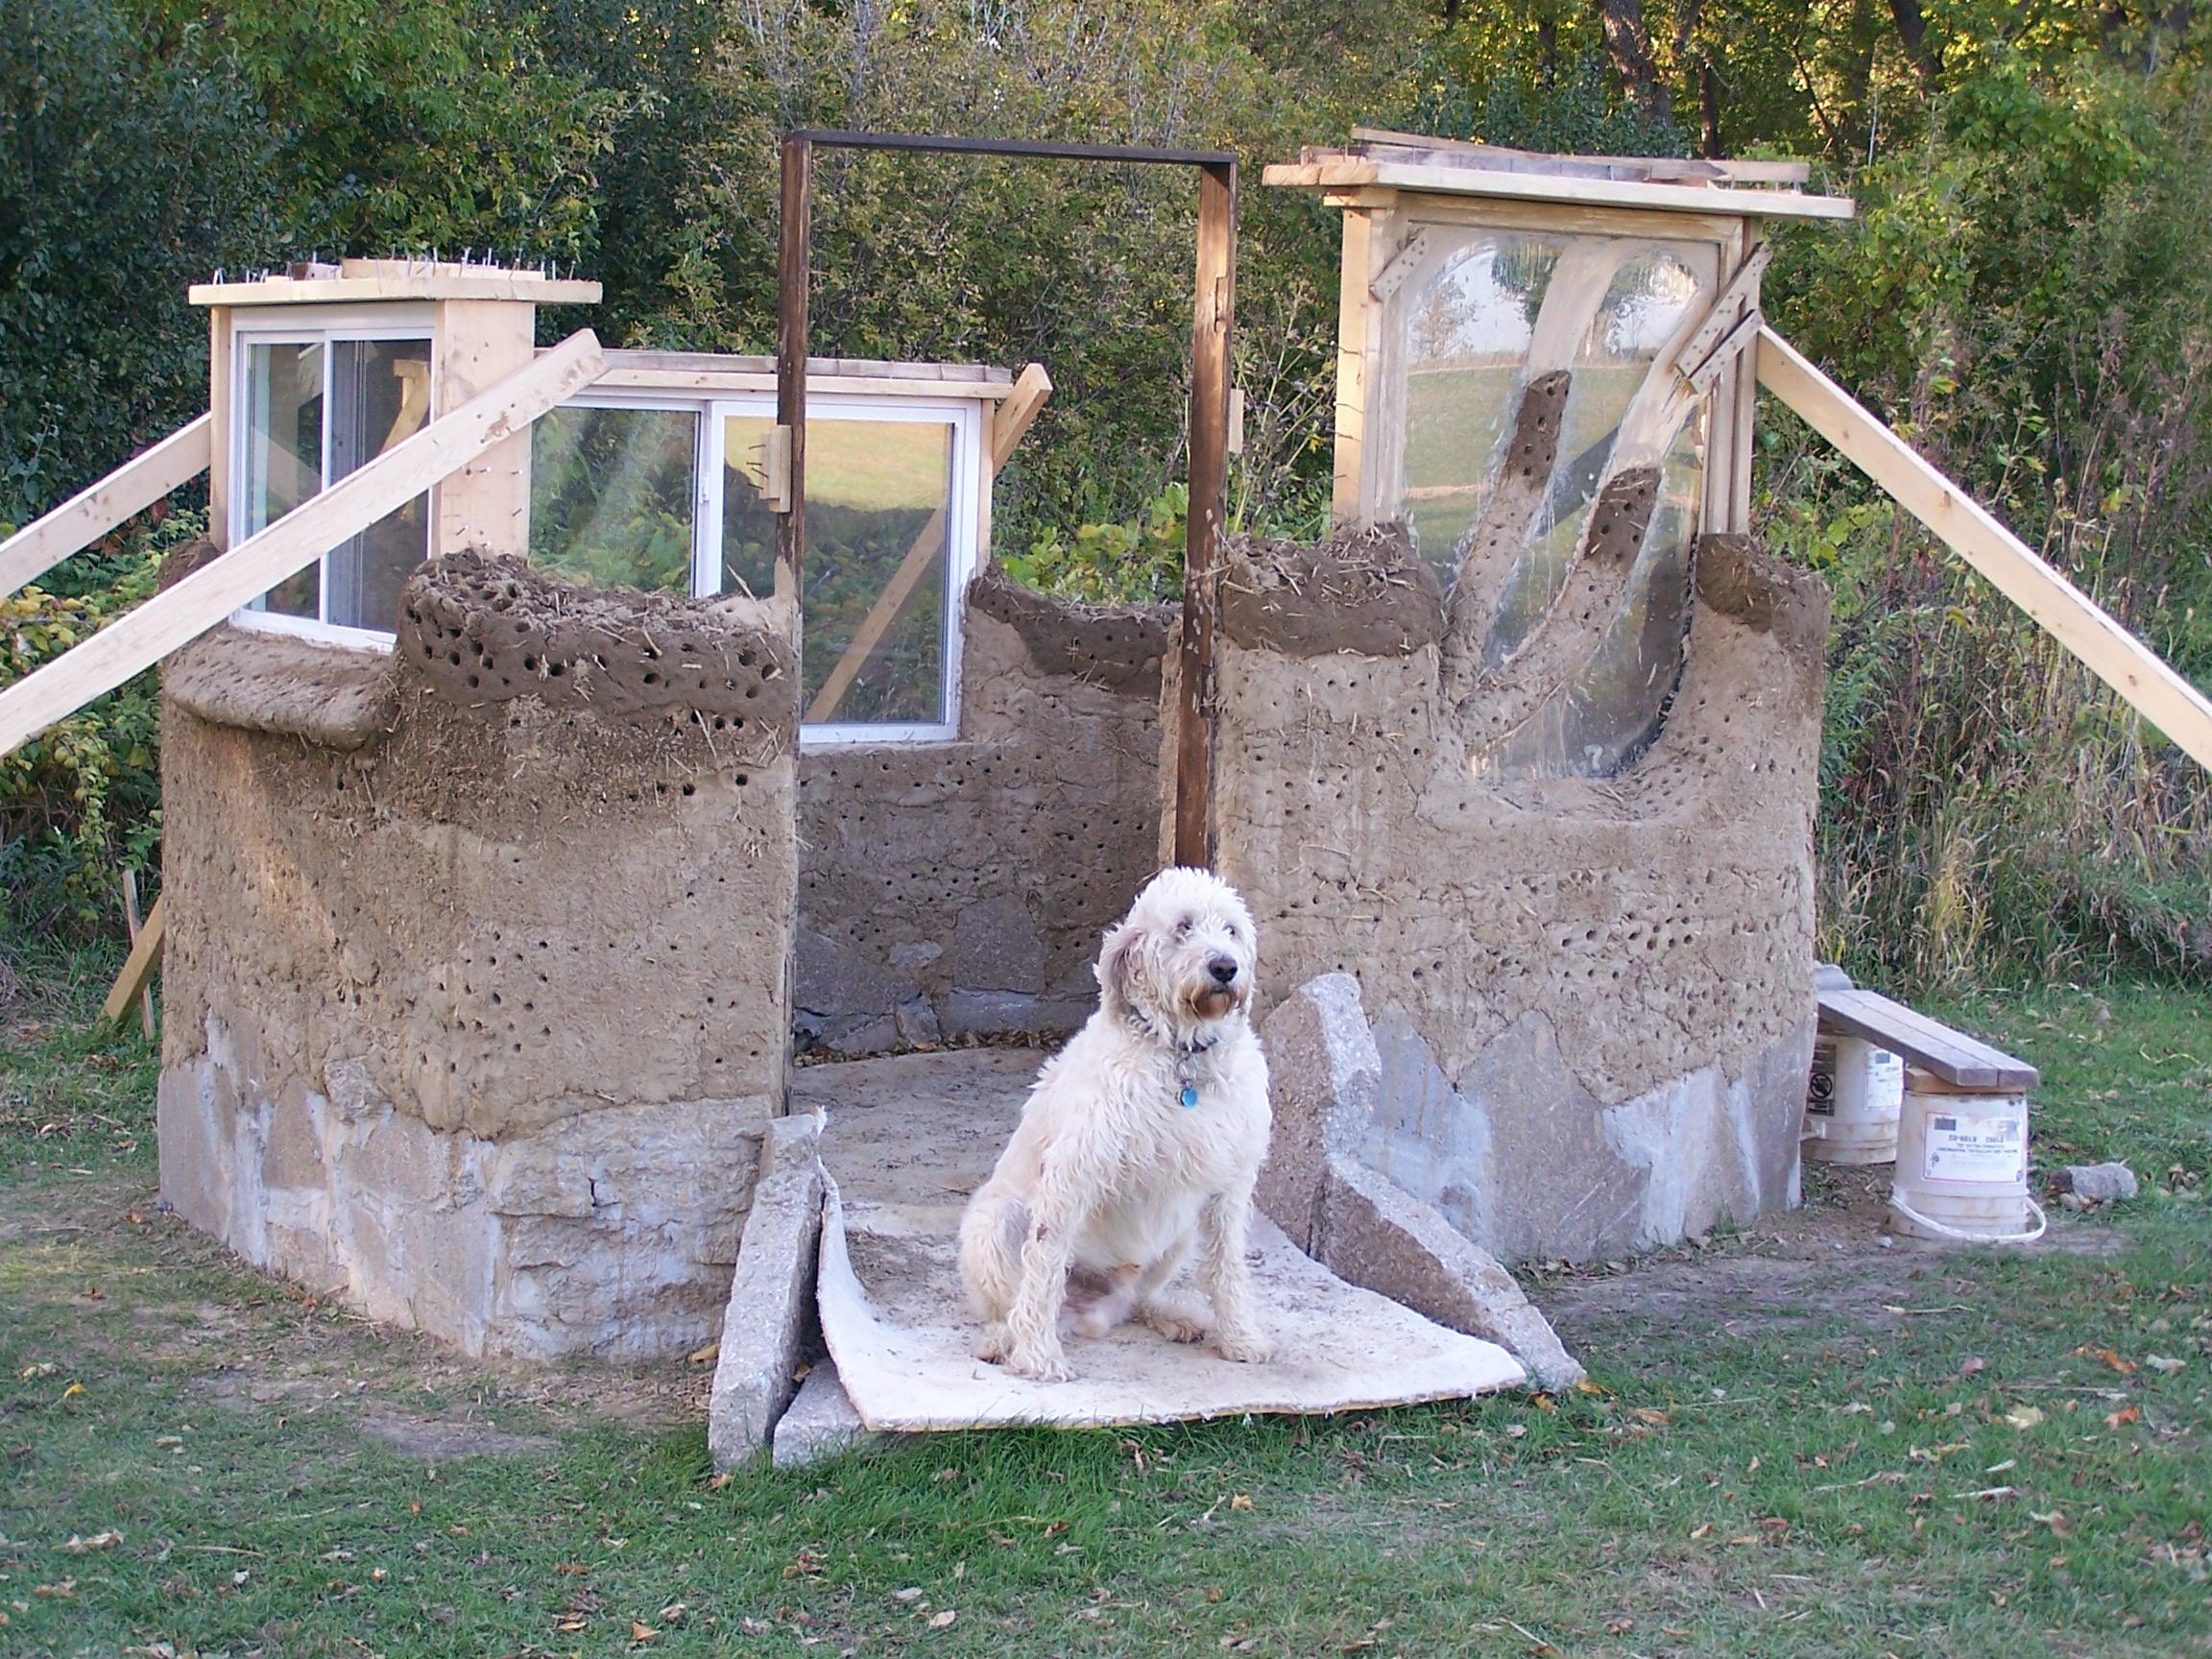 Cob Compost Outhouse Makoce Waste Wiconi Waste Sweet